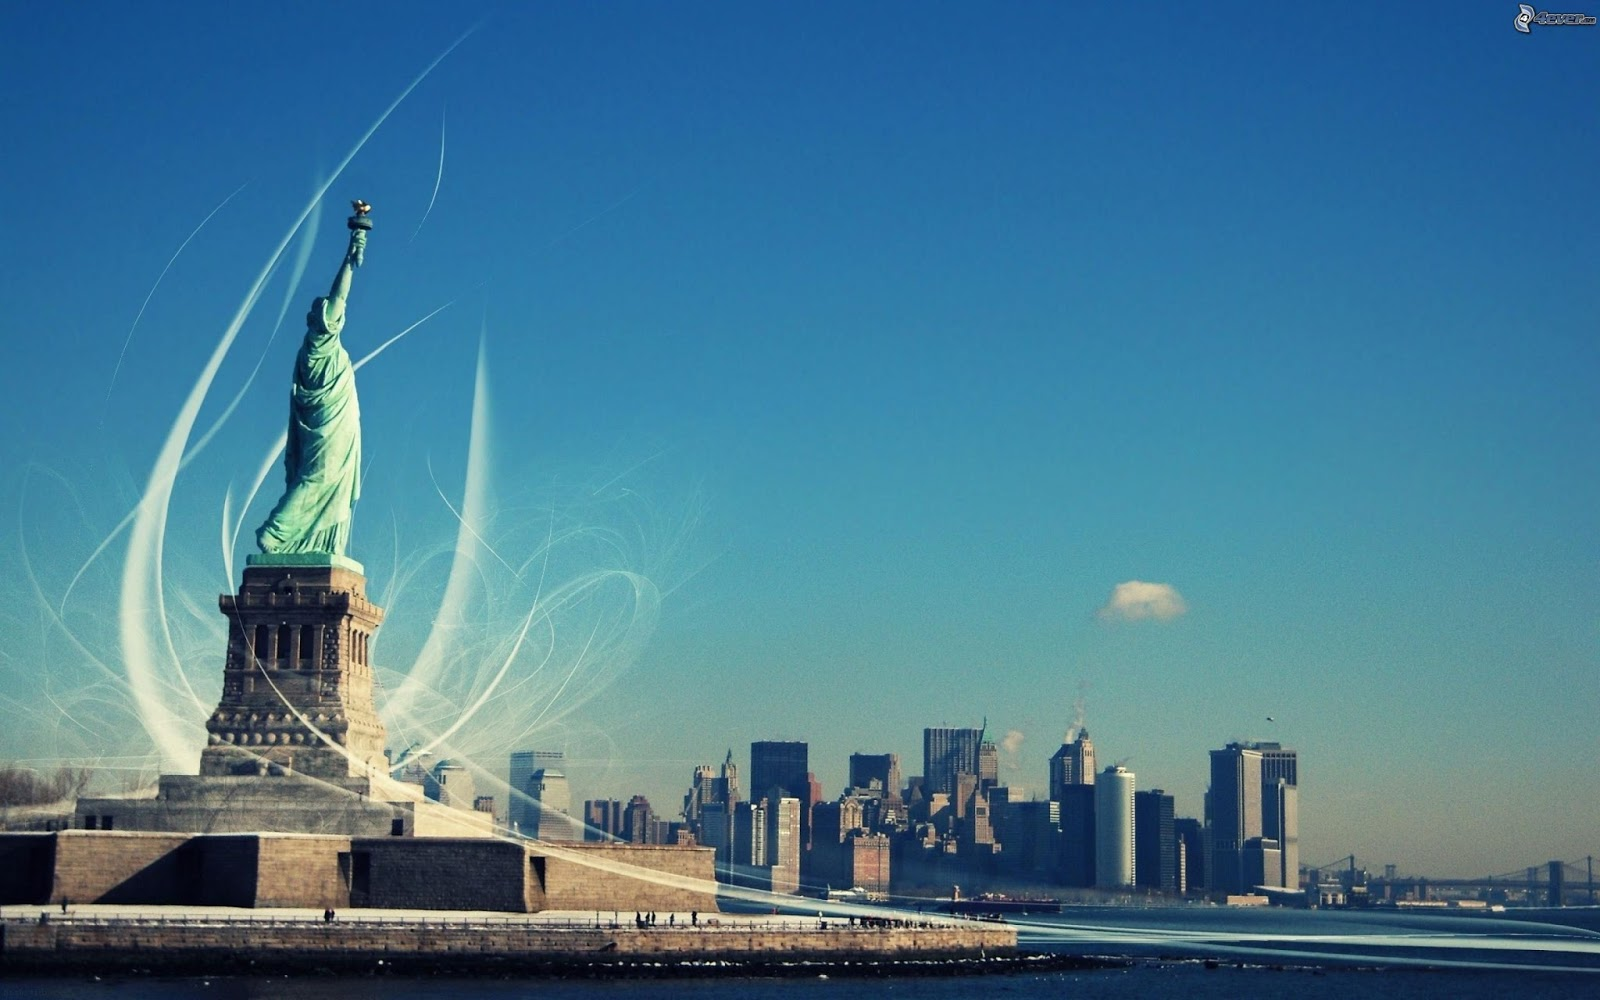 M 225 s pomada hablemos de la estatua de la libertad